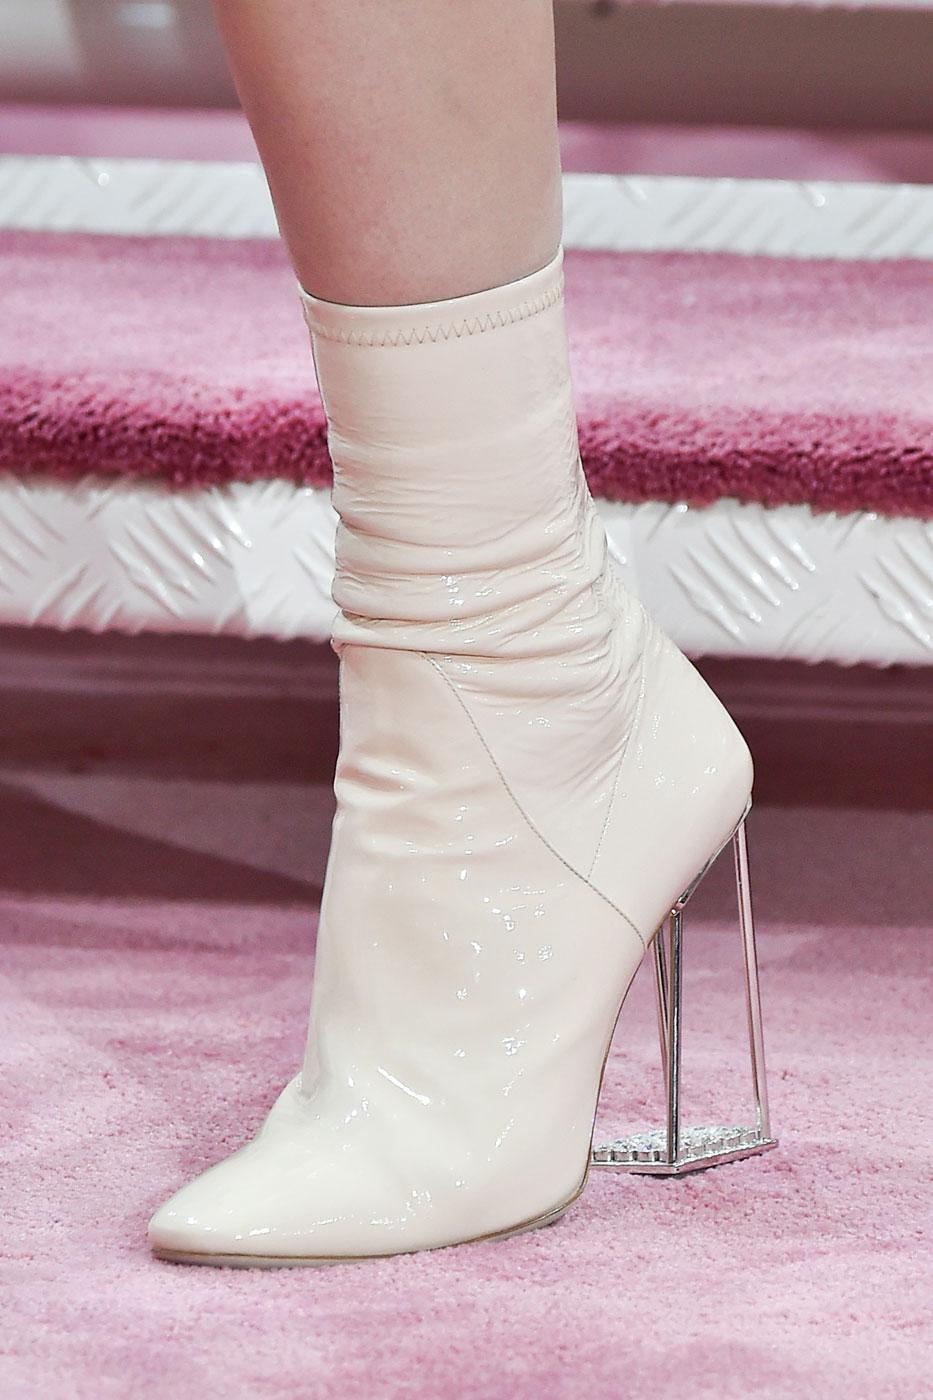 Christian-Dior-fashion-runway-show-close-ups-haute-couture-paris-spring-summer-2015-the-impression-074